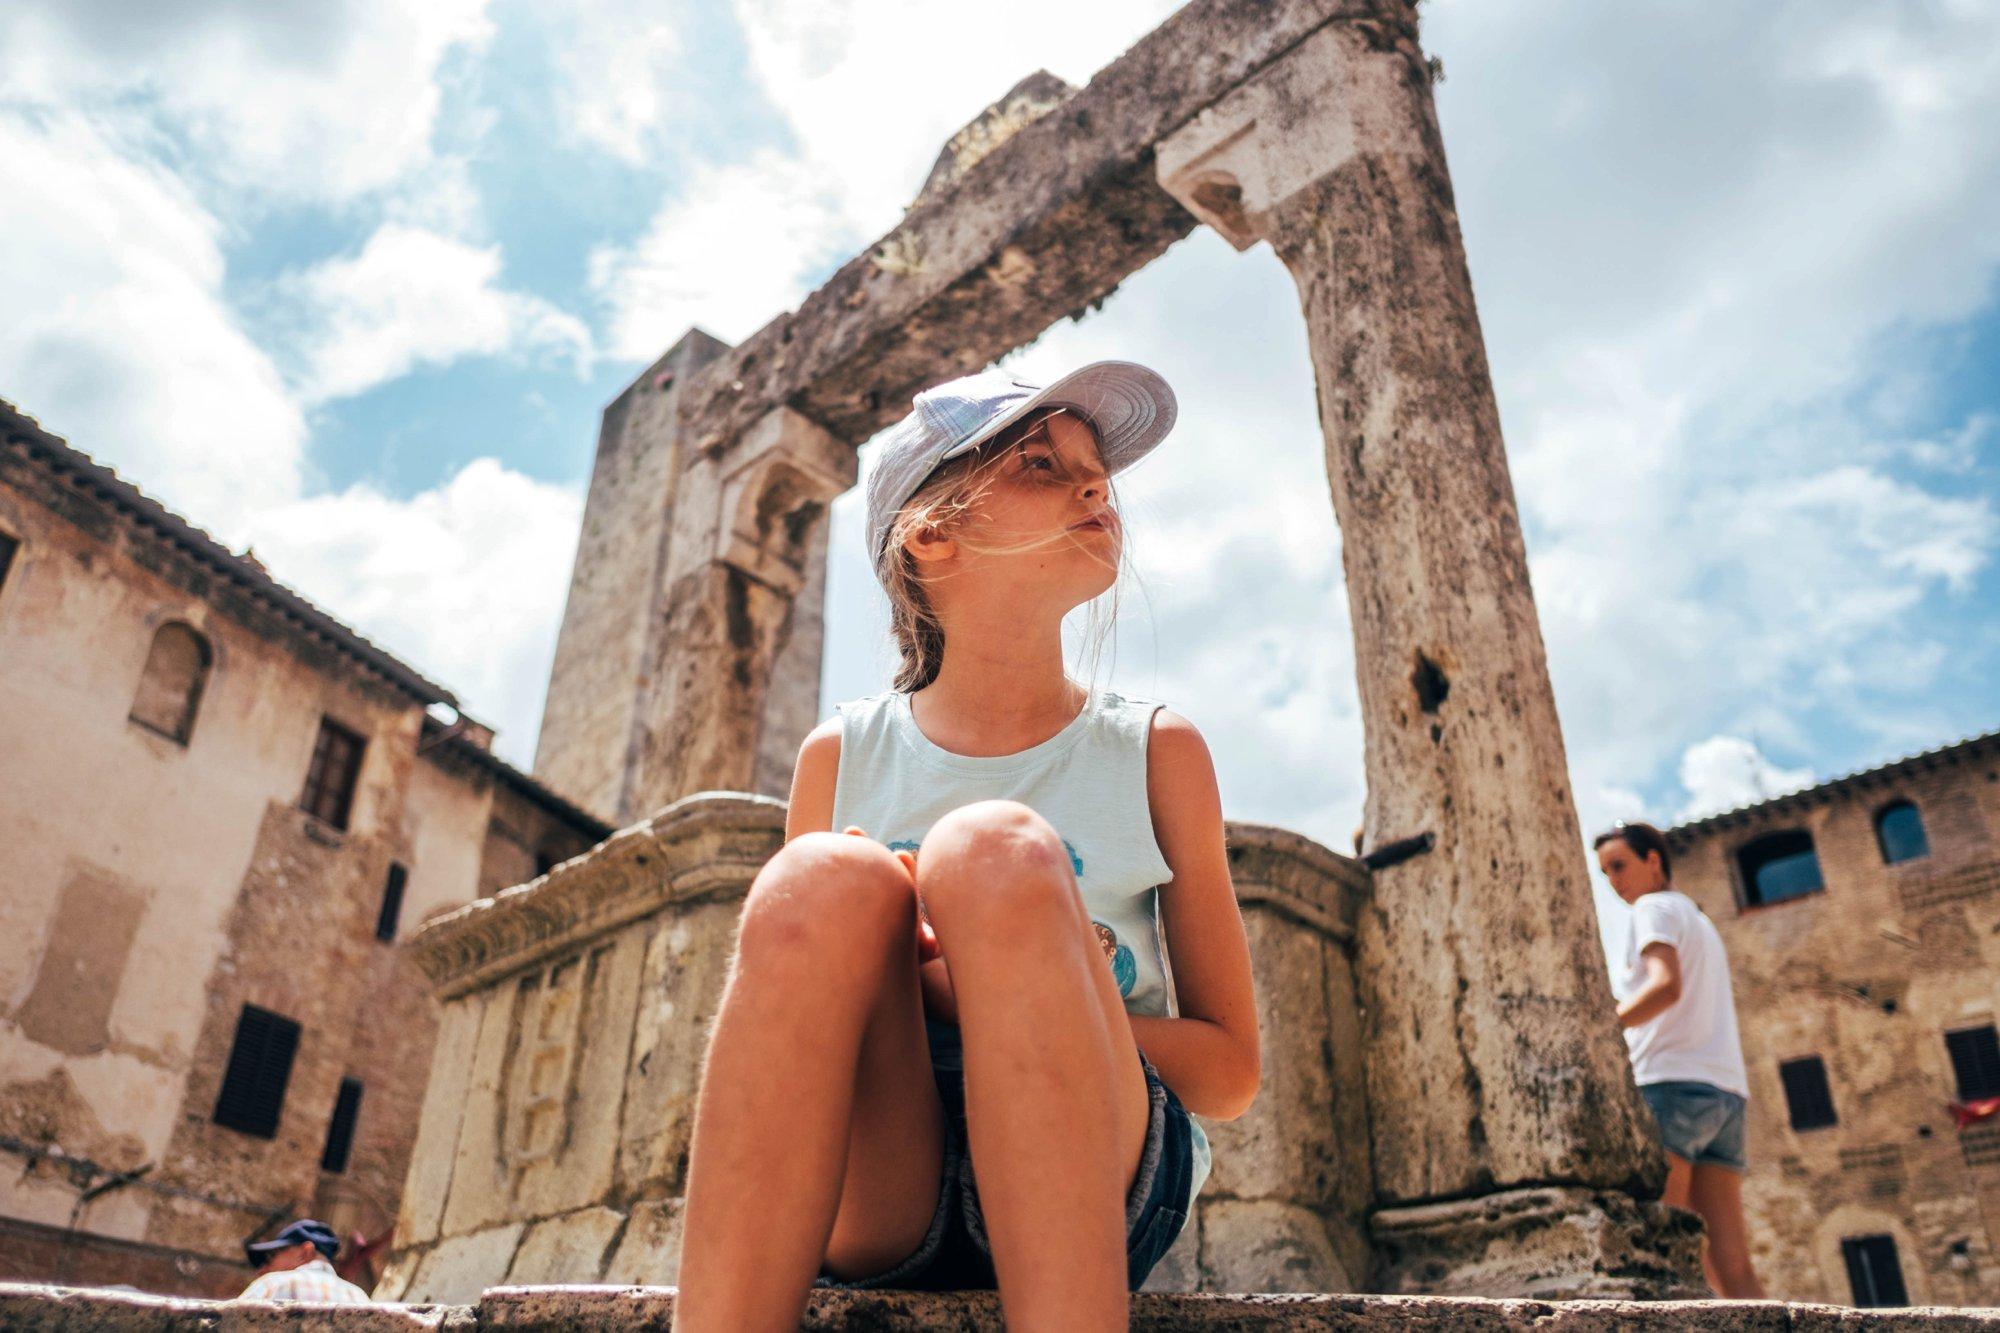 Little girl by well St Gimignano Tuscany Essex Documentary Wedding Travel Photographer